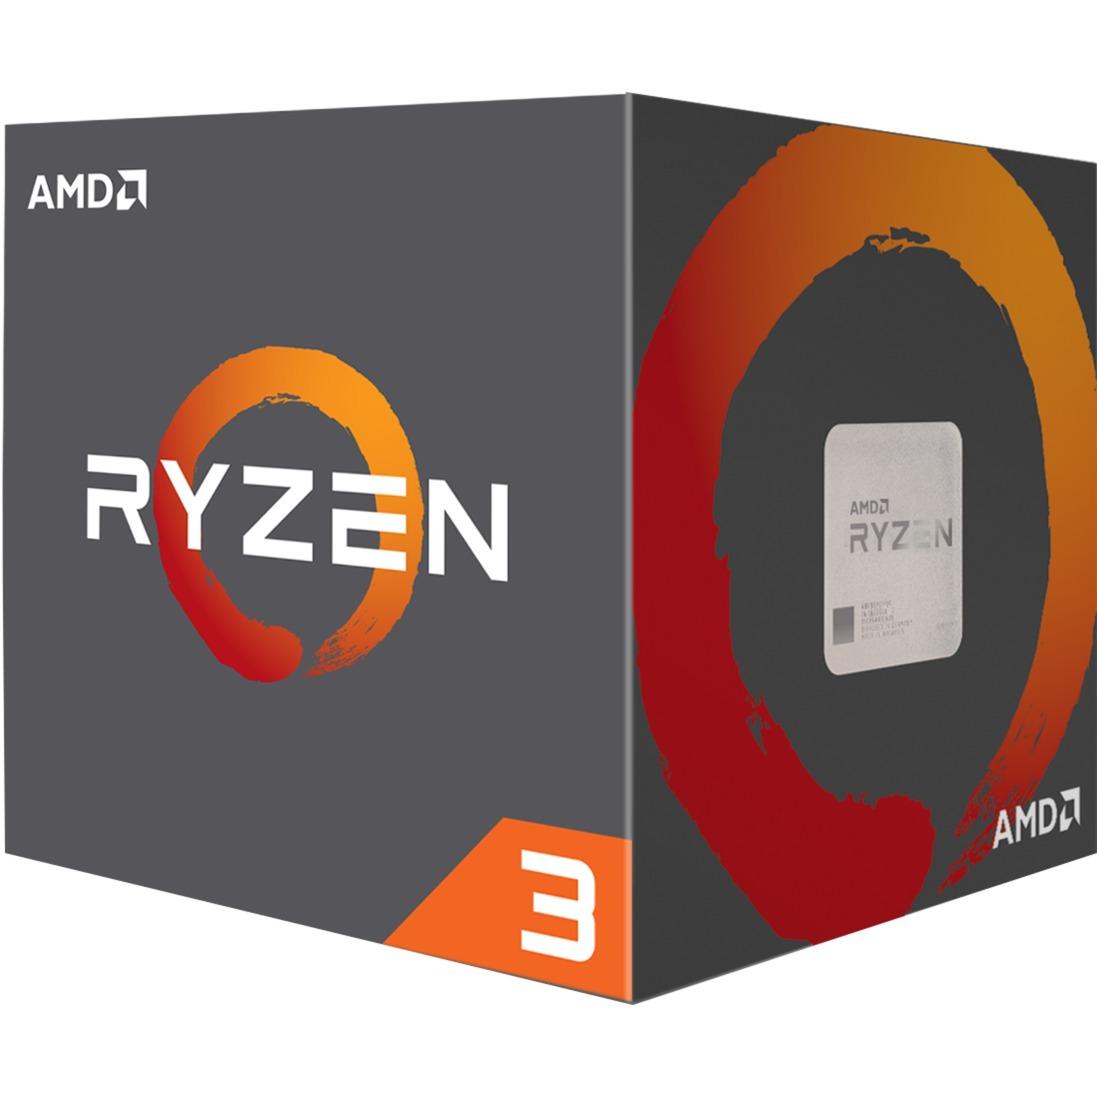 Ryzen 3 1200 3.1GHz 8MB L3 Caja procesador